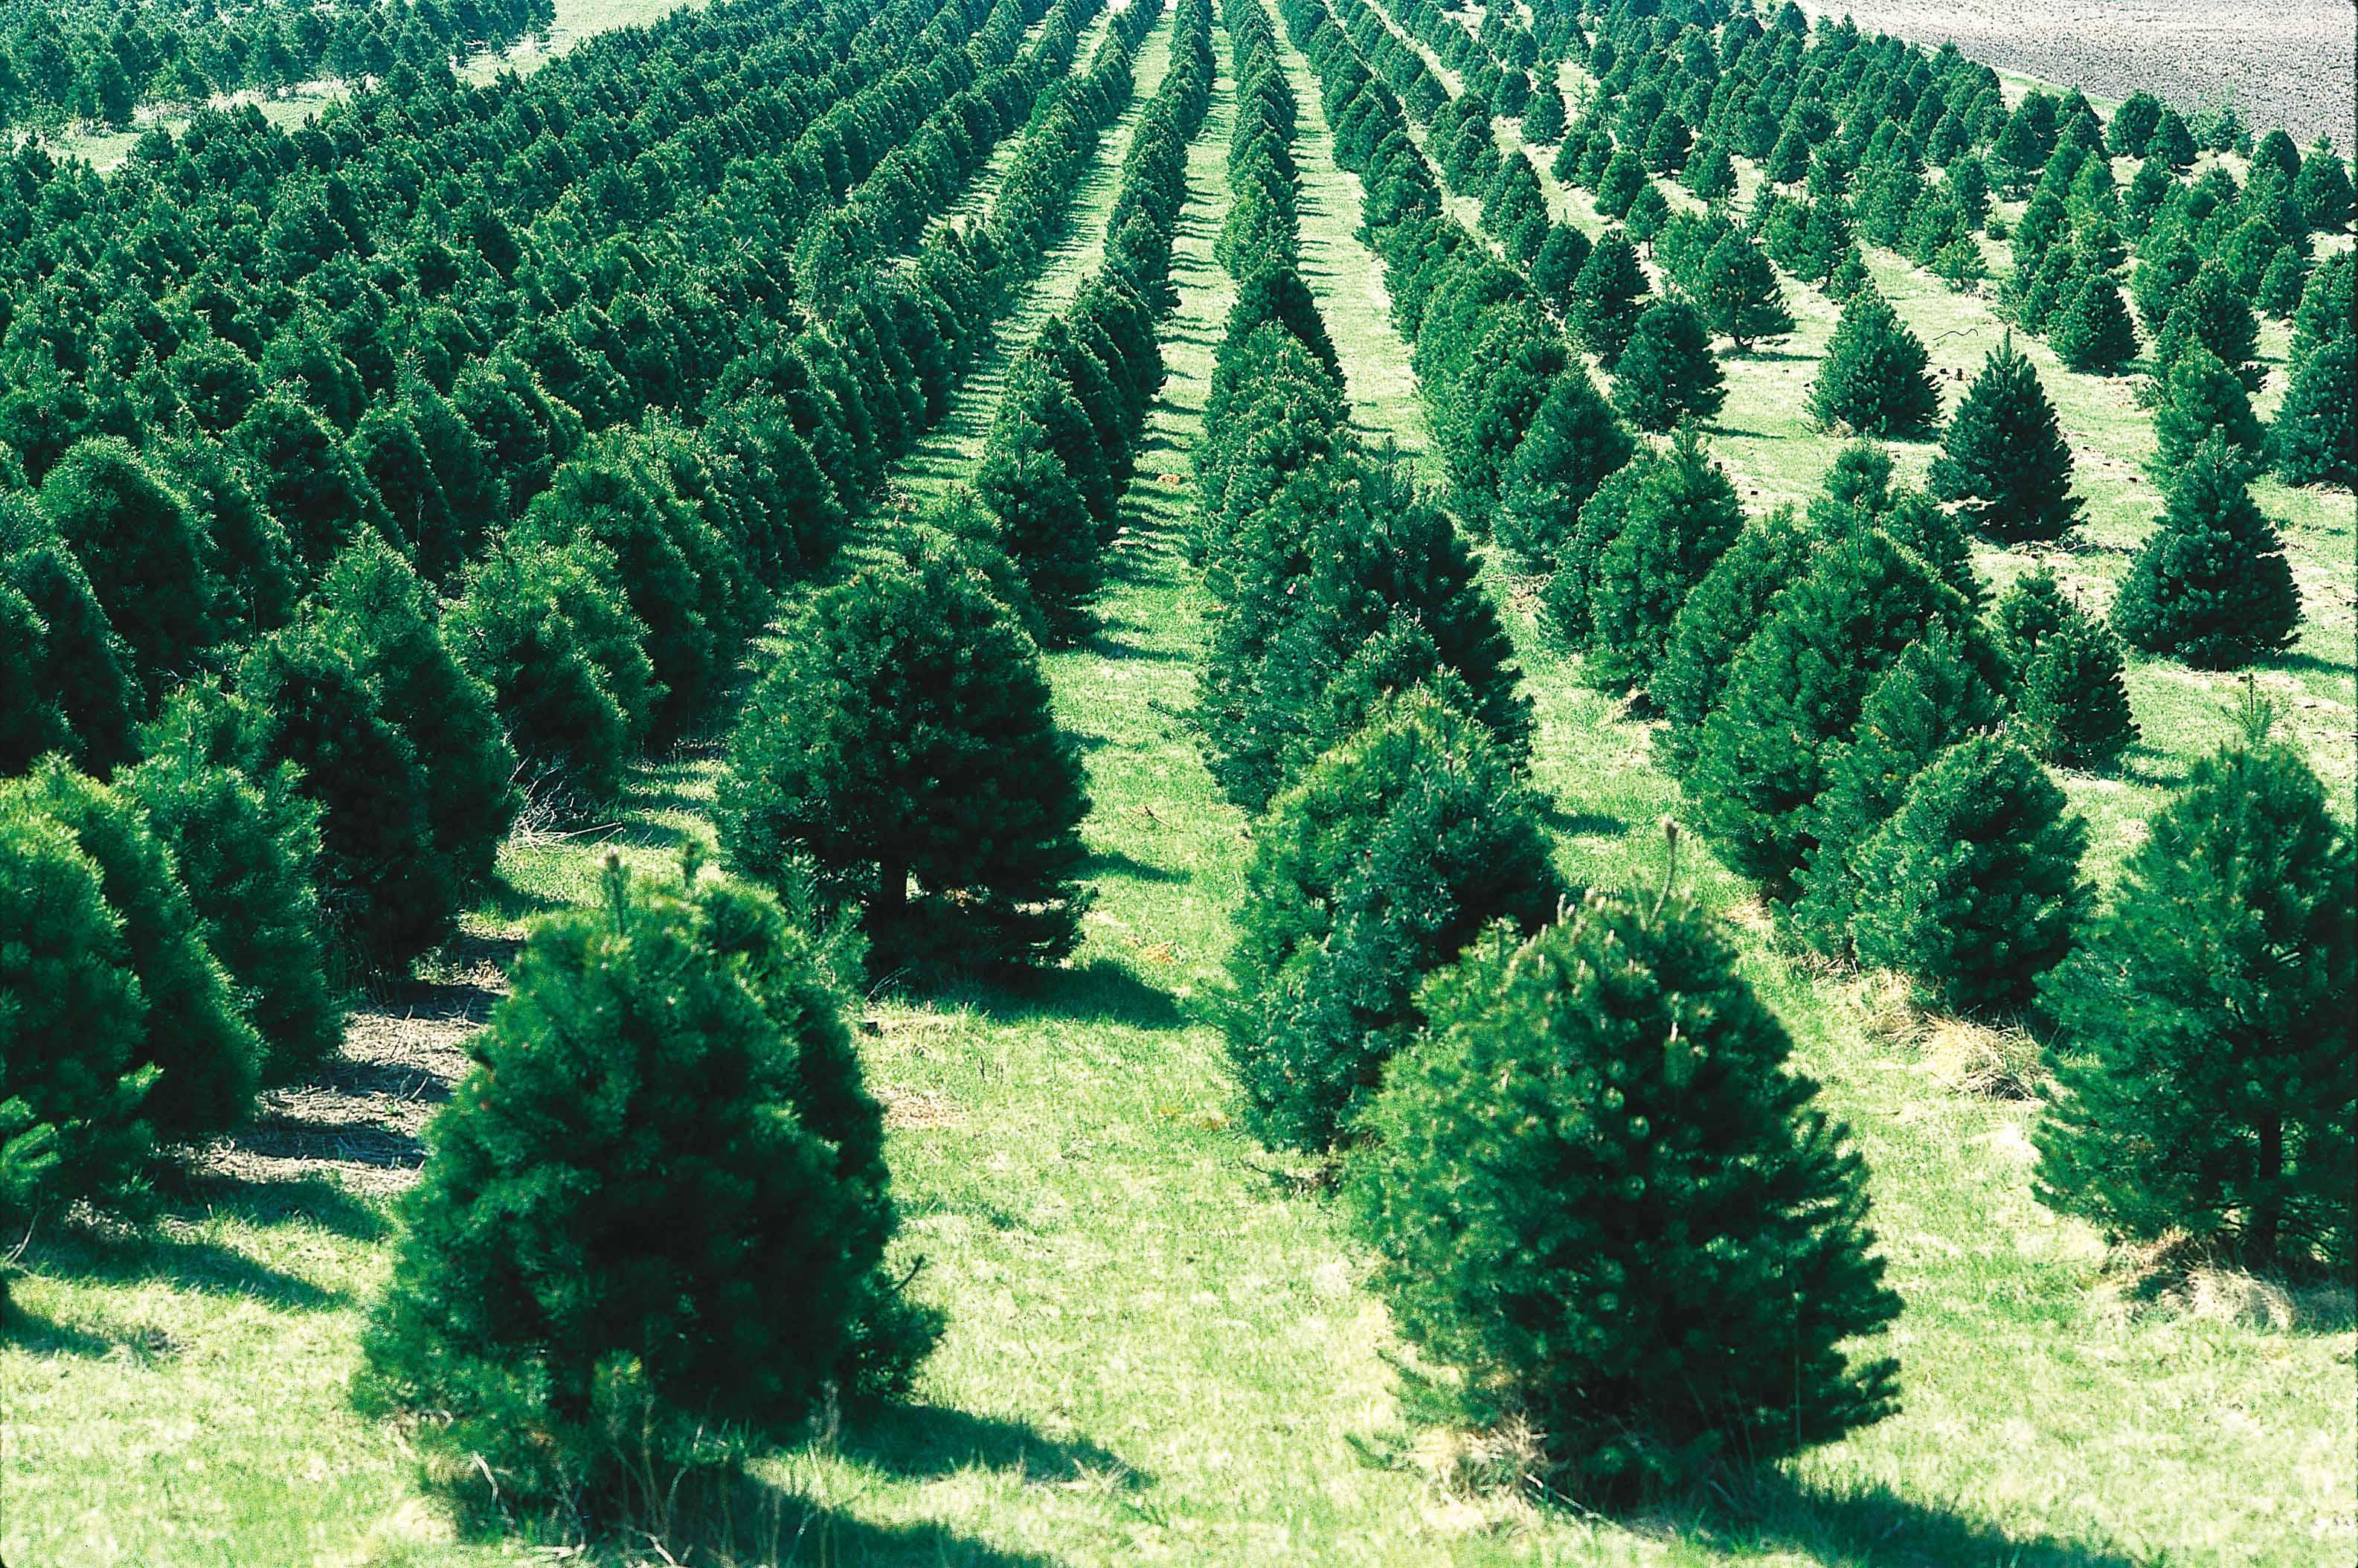 Christmas Tree Farm Arizona.Christmas Tree Cutting Permits Avaliable Nov 17 Arizona News